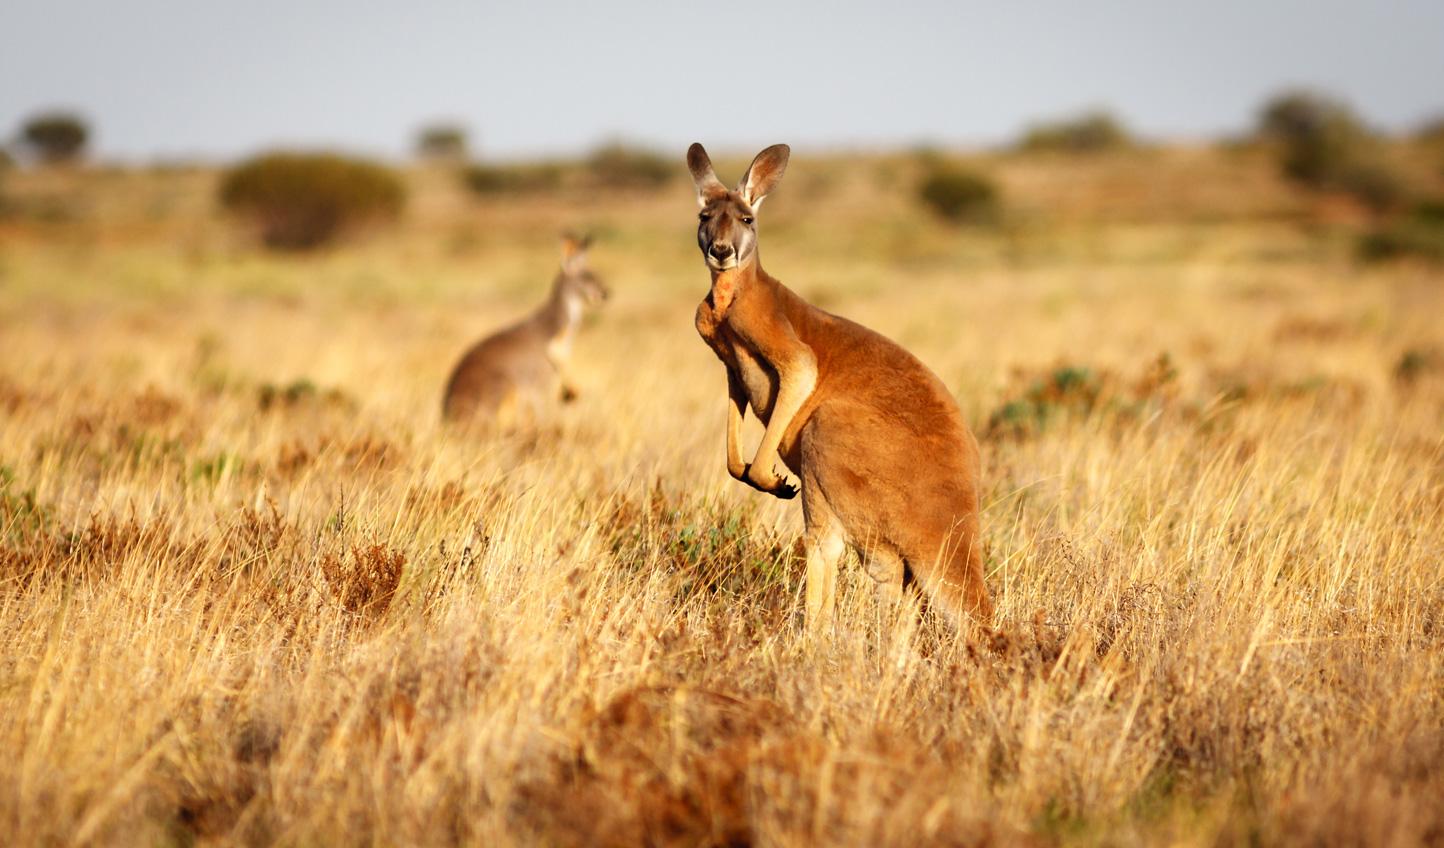 Breakfast with kangaroos in the Australian bush